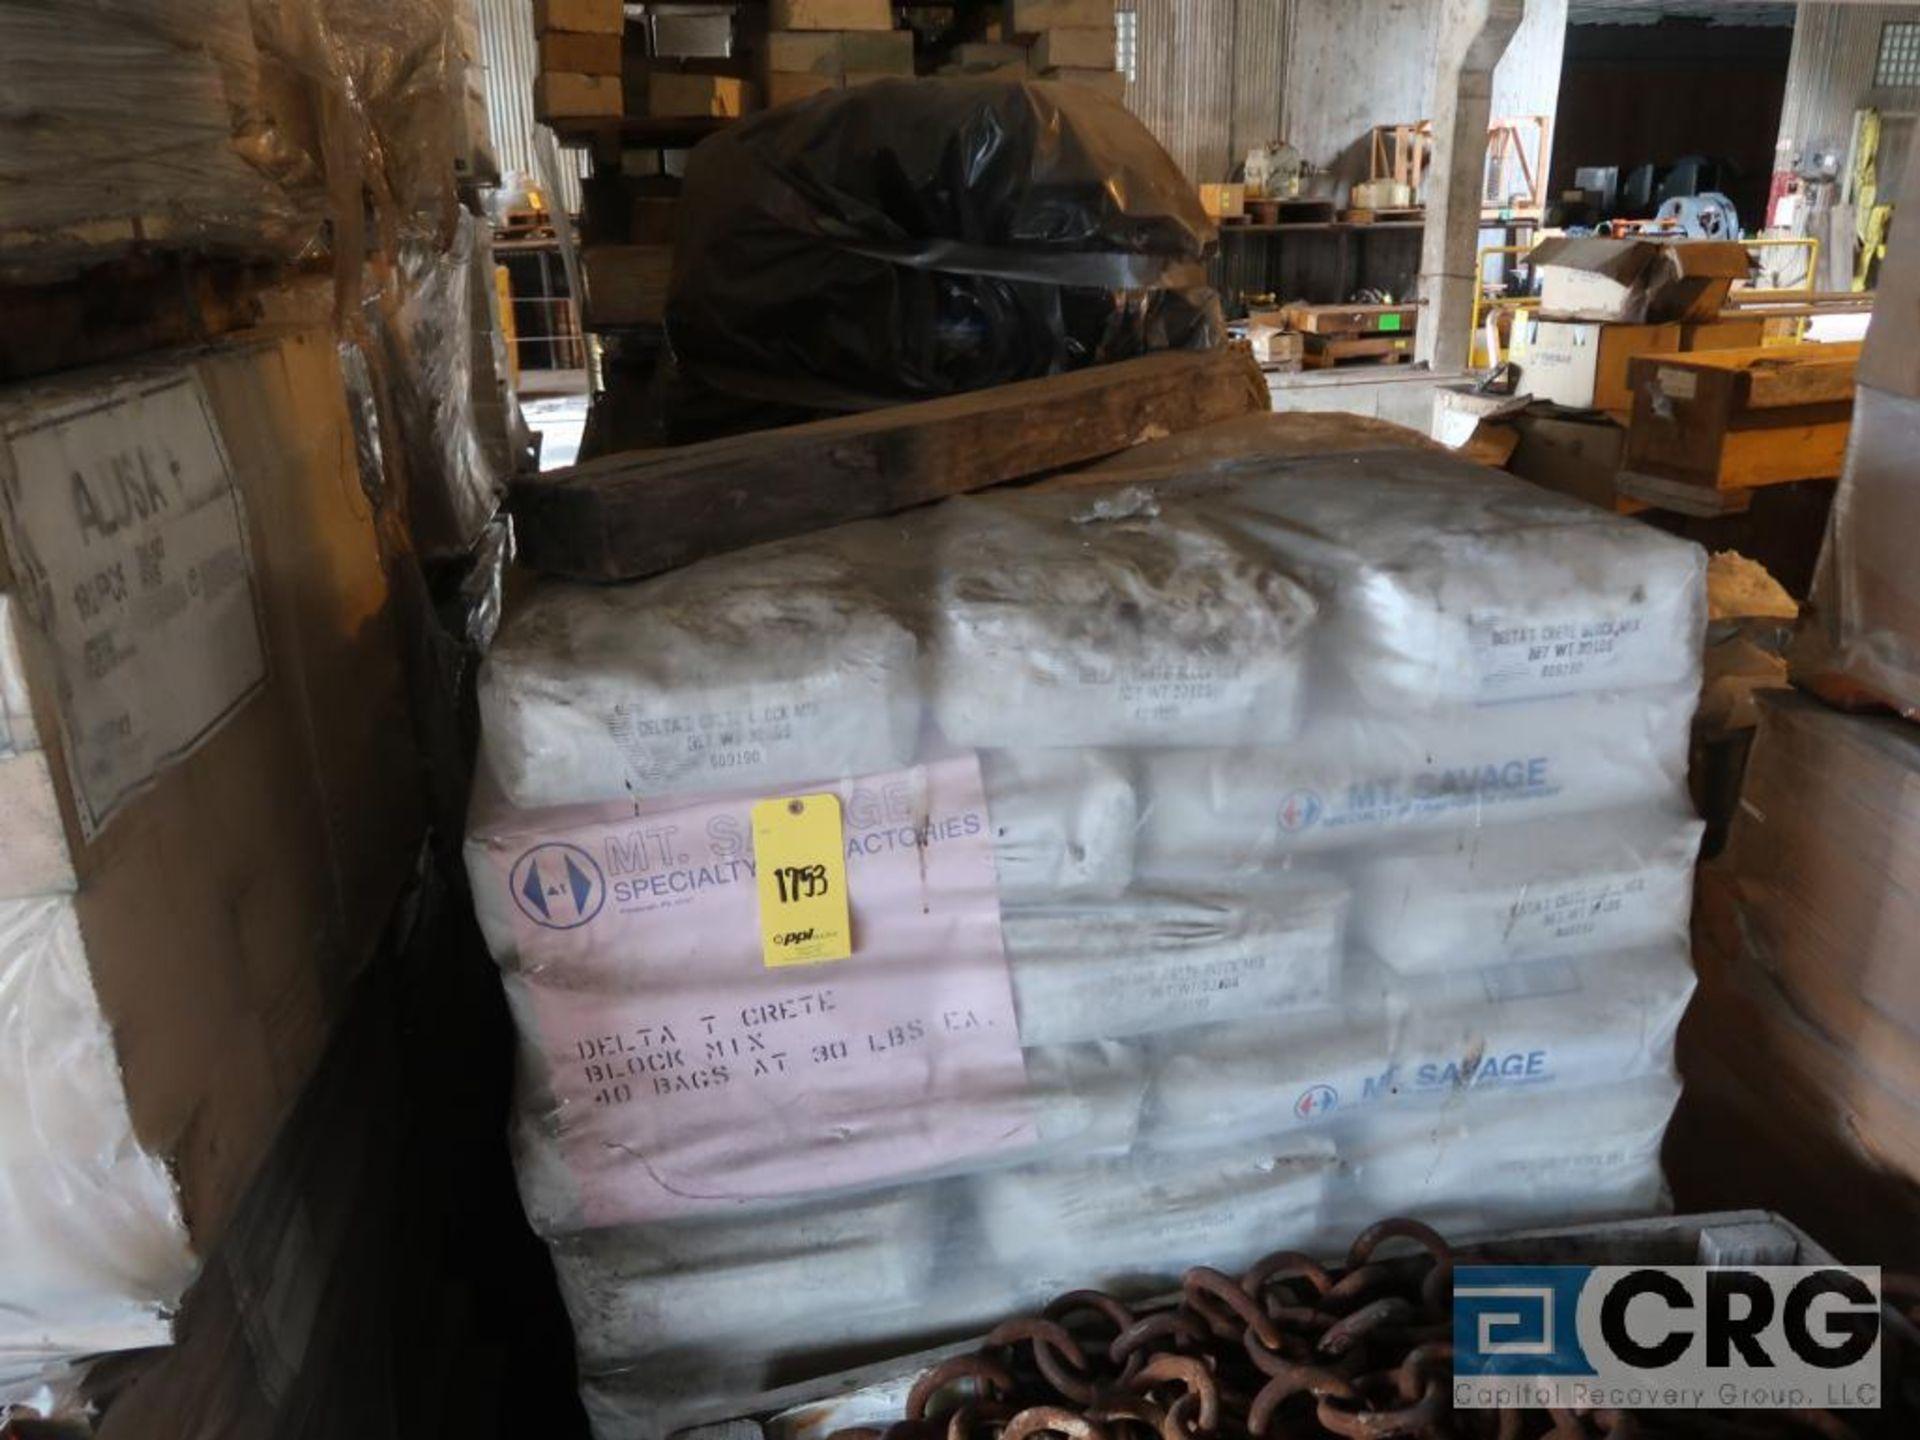 Lot of (31) pallets kiln brick, (1) pallet crete block mix, and (3) pallets ceramic coupling (Next - Image 3 of 5